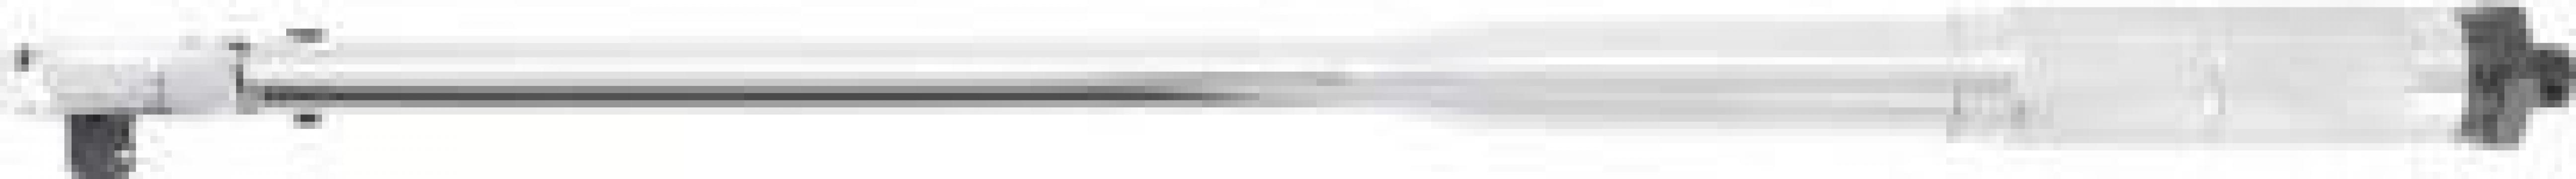 Cheie dinamometrica 12,5 mm (1/2